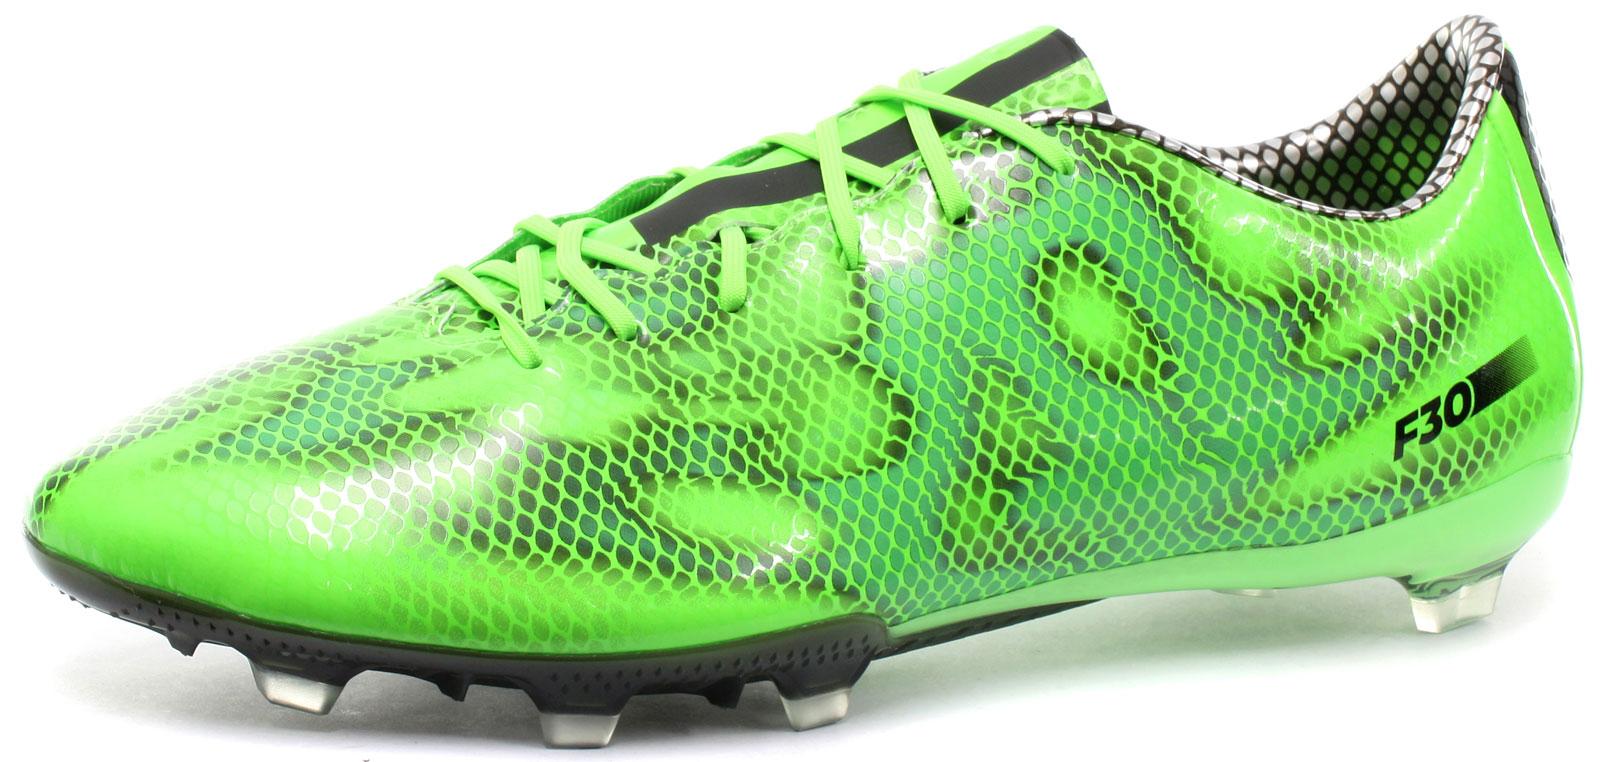 33000b07e2b1 adidas F30 FG Mens Football BOOTS All Sizes W13 M11 for sale online ...